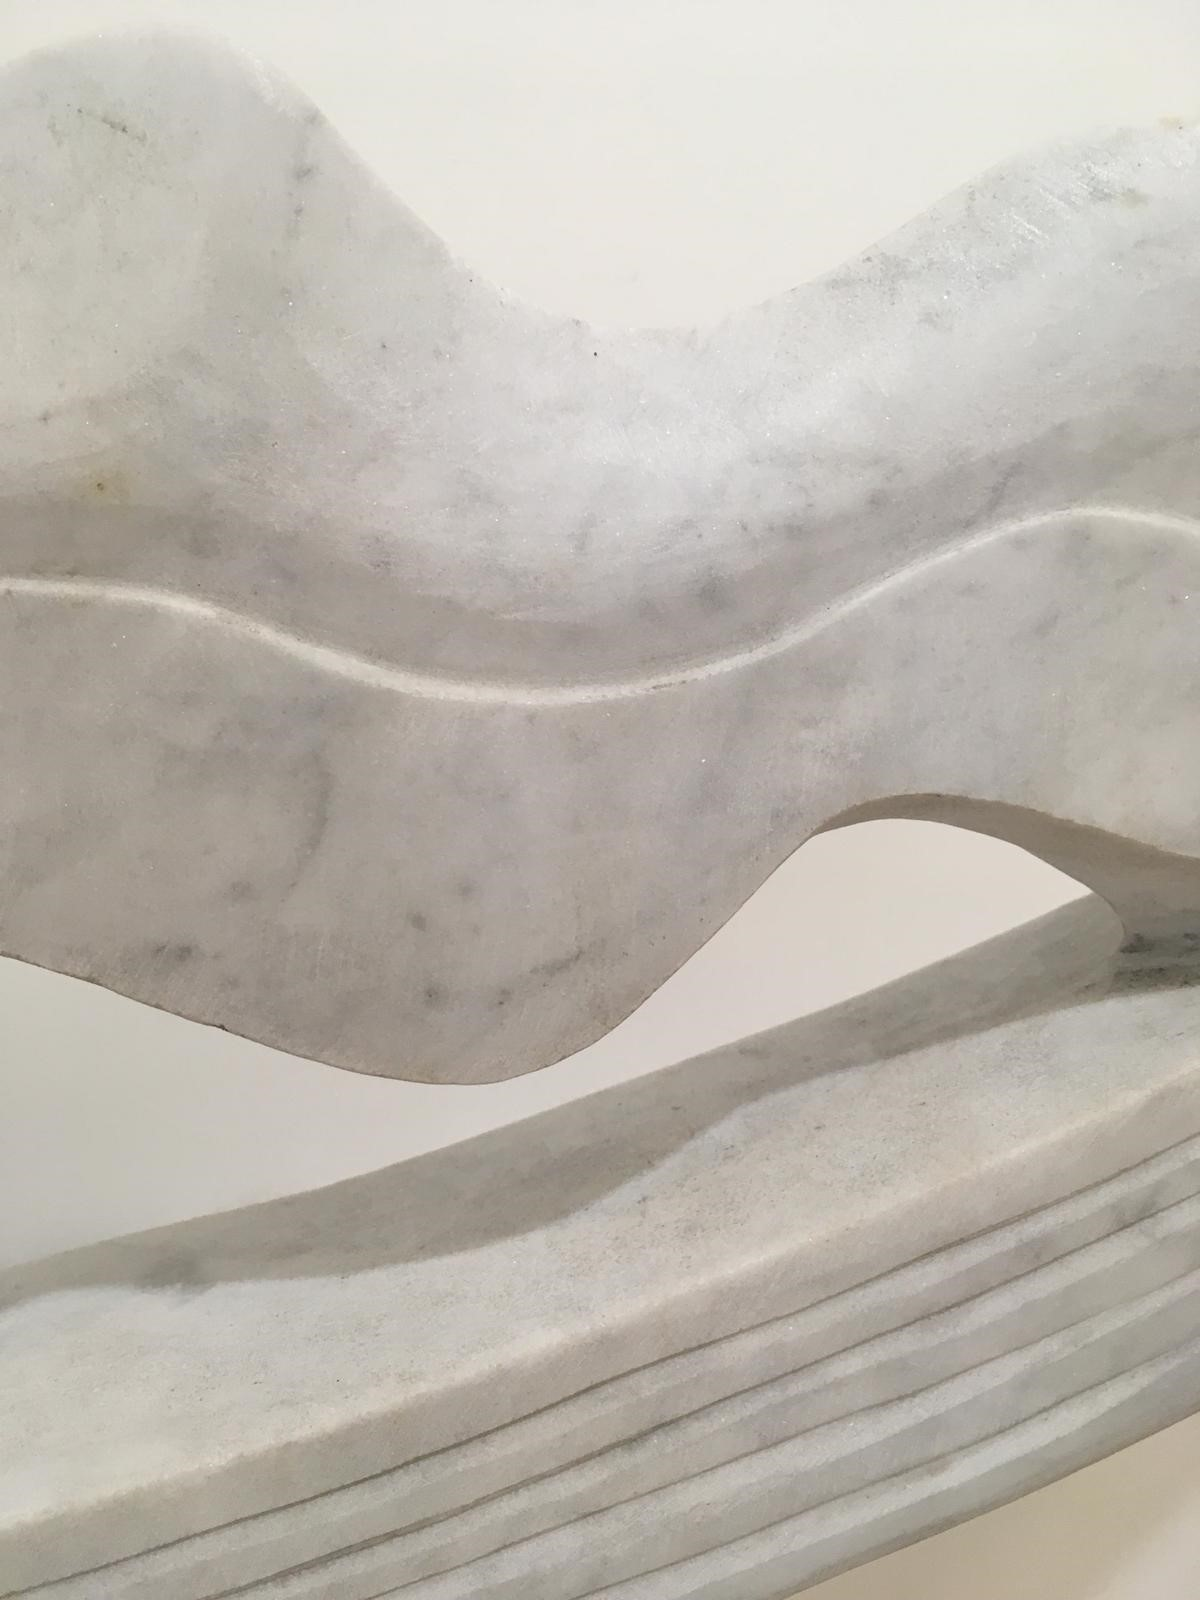 'Ripple (Carrara Marble and Caithness Stone Base)' by artist Tom Allan